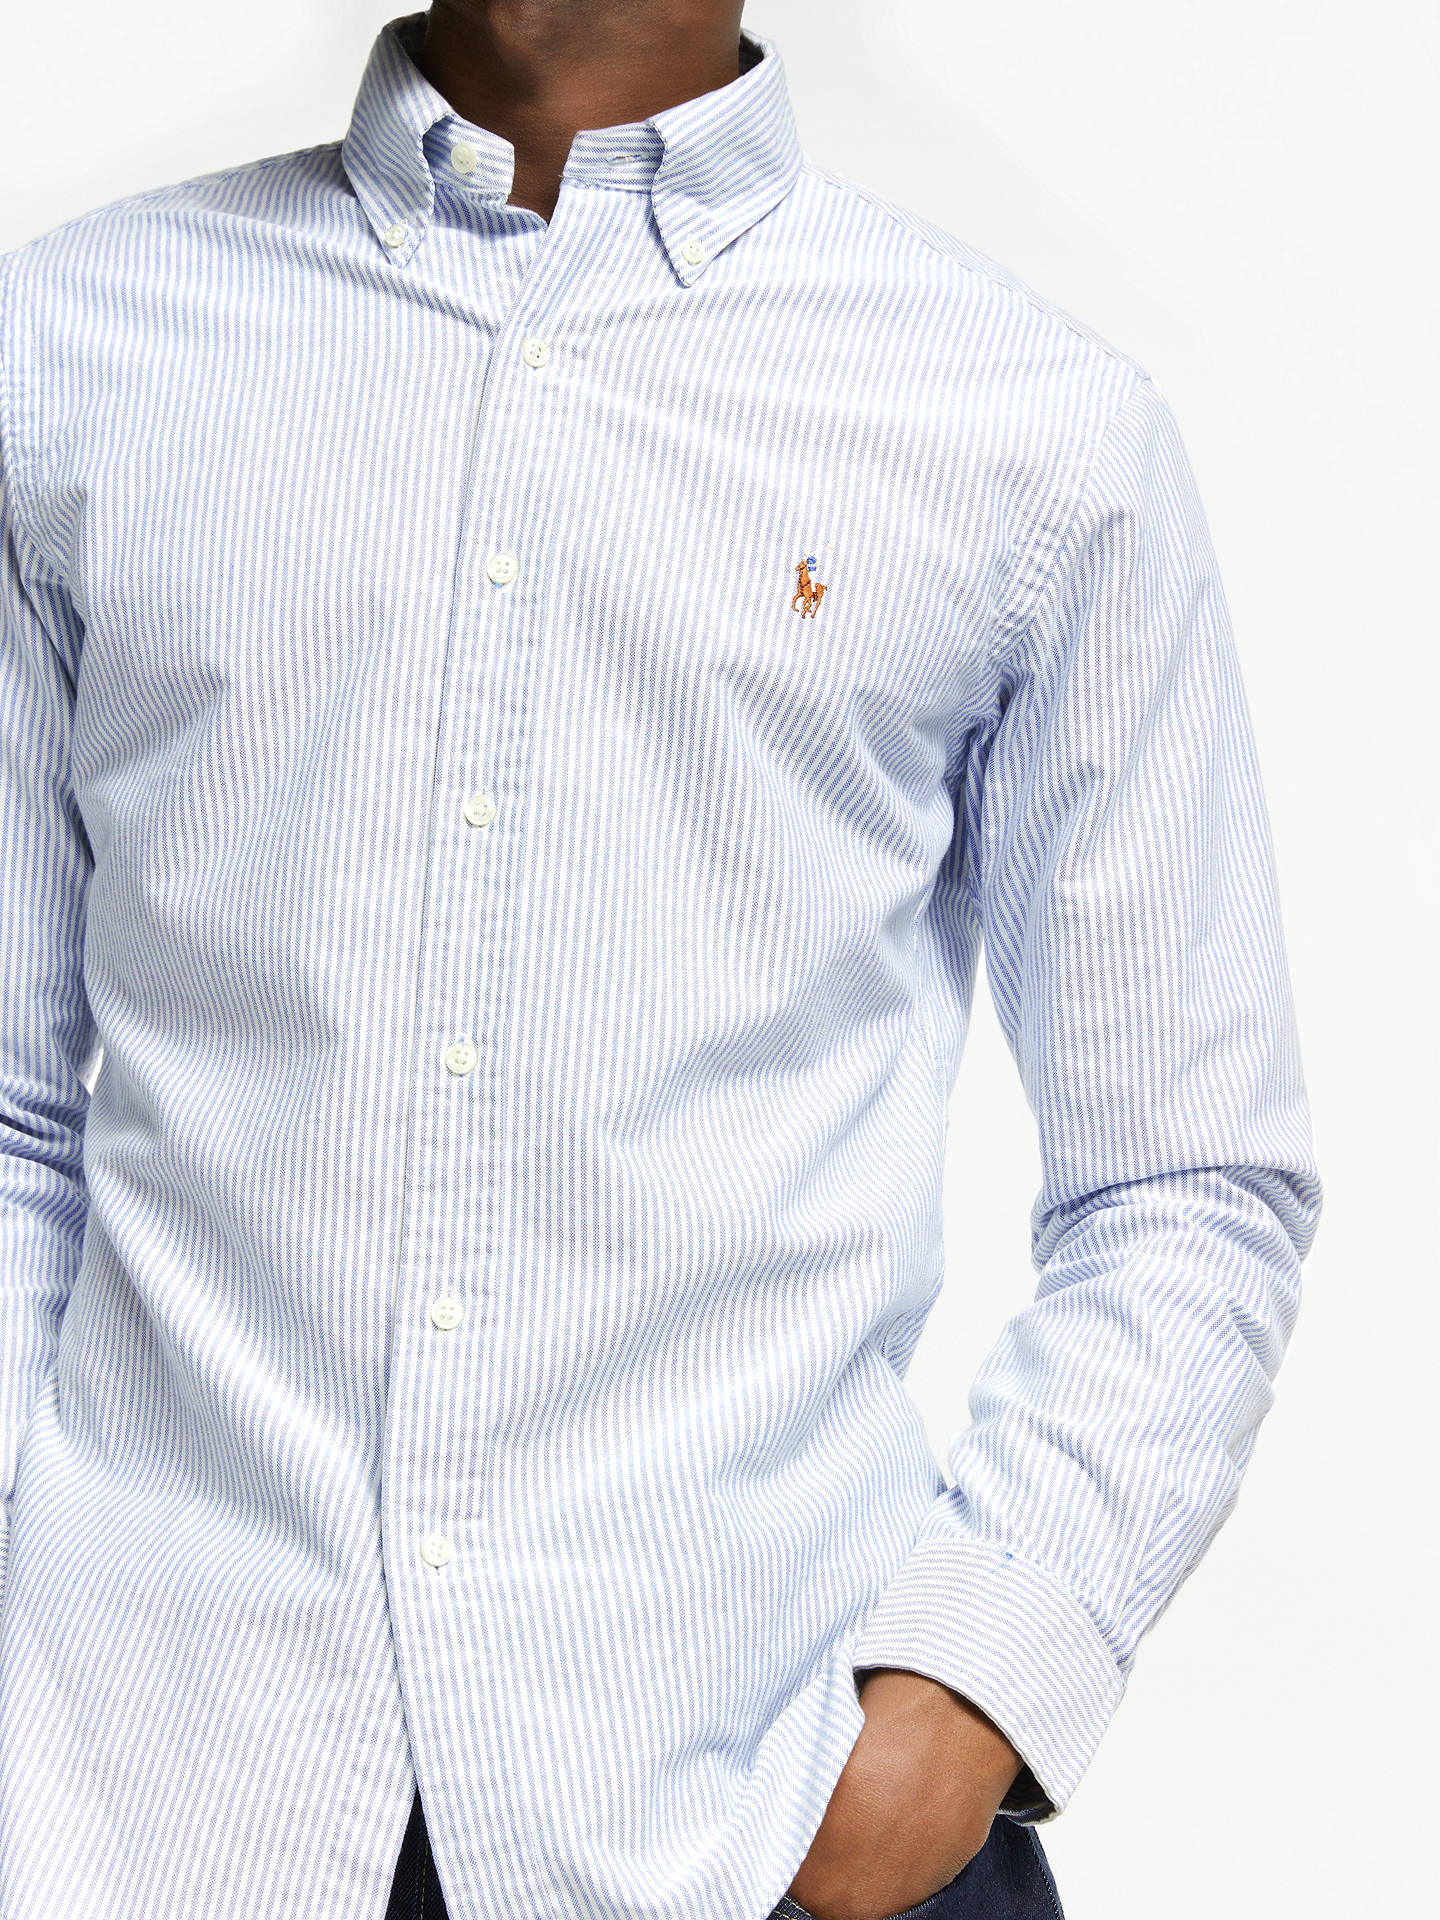 b01334471b8d Buy Polo Ralph Lauren Slim Fit Striped Oxford Shirt, Blue/White, S Online  ...